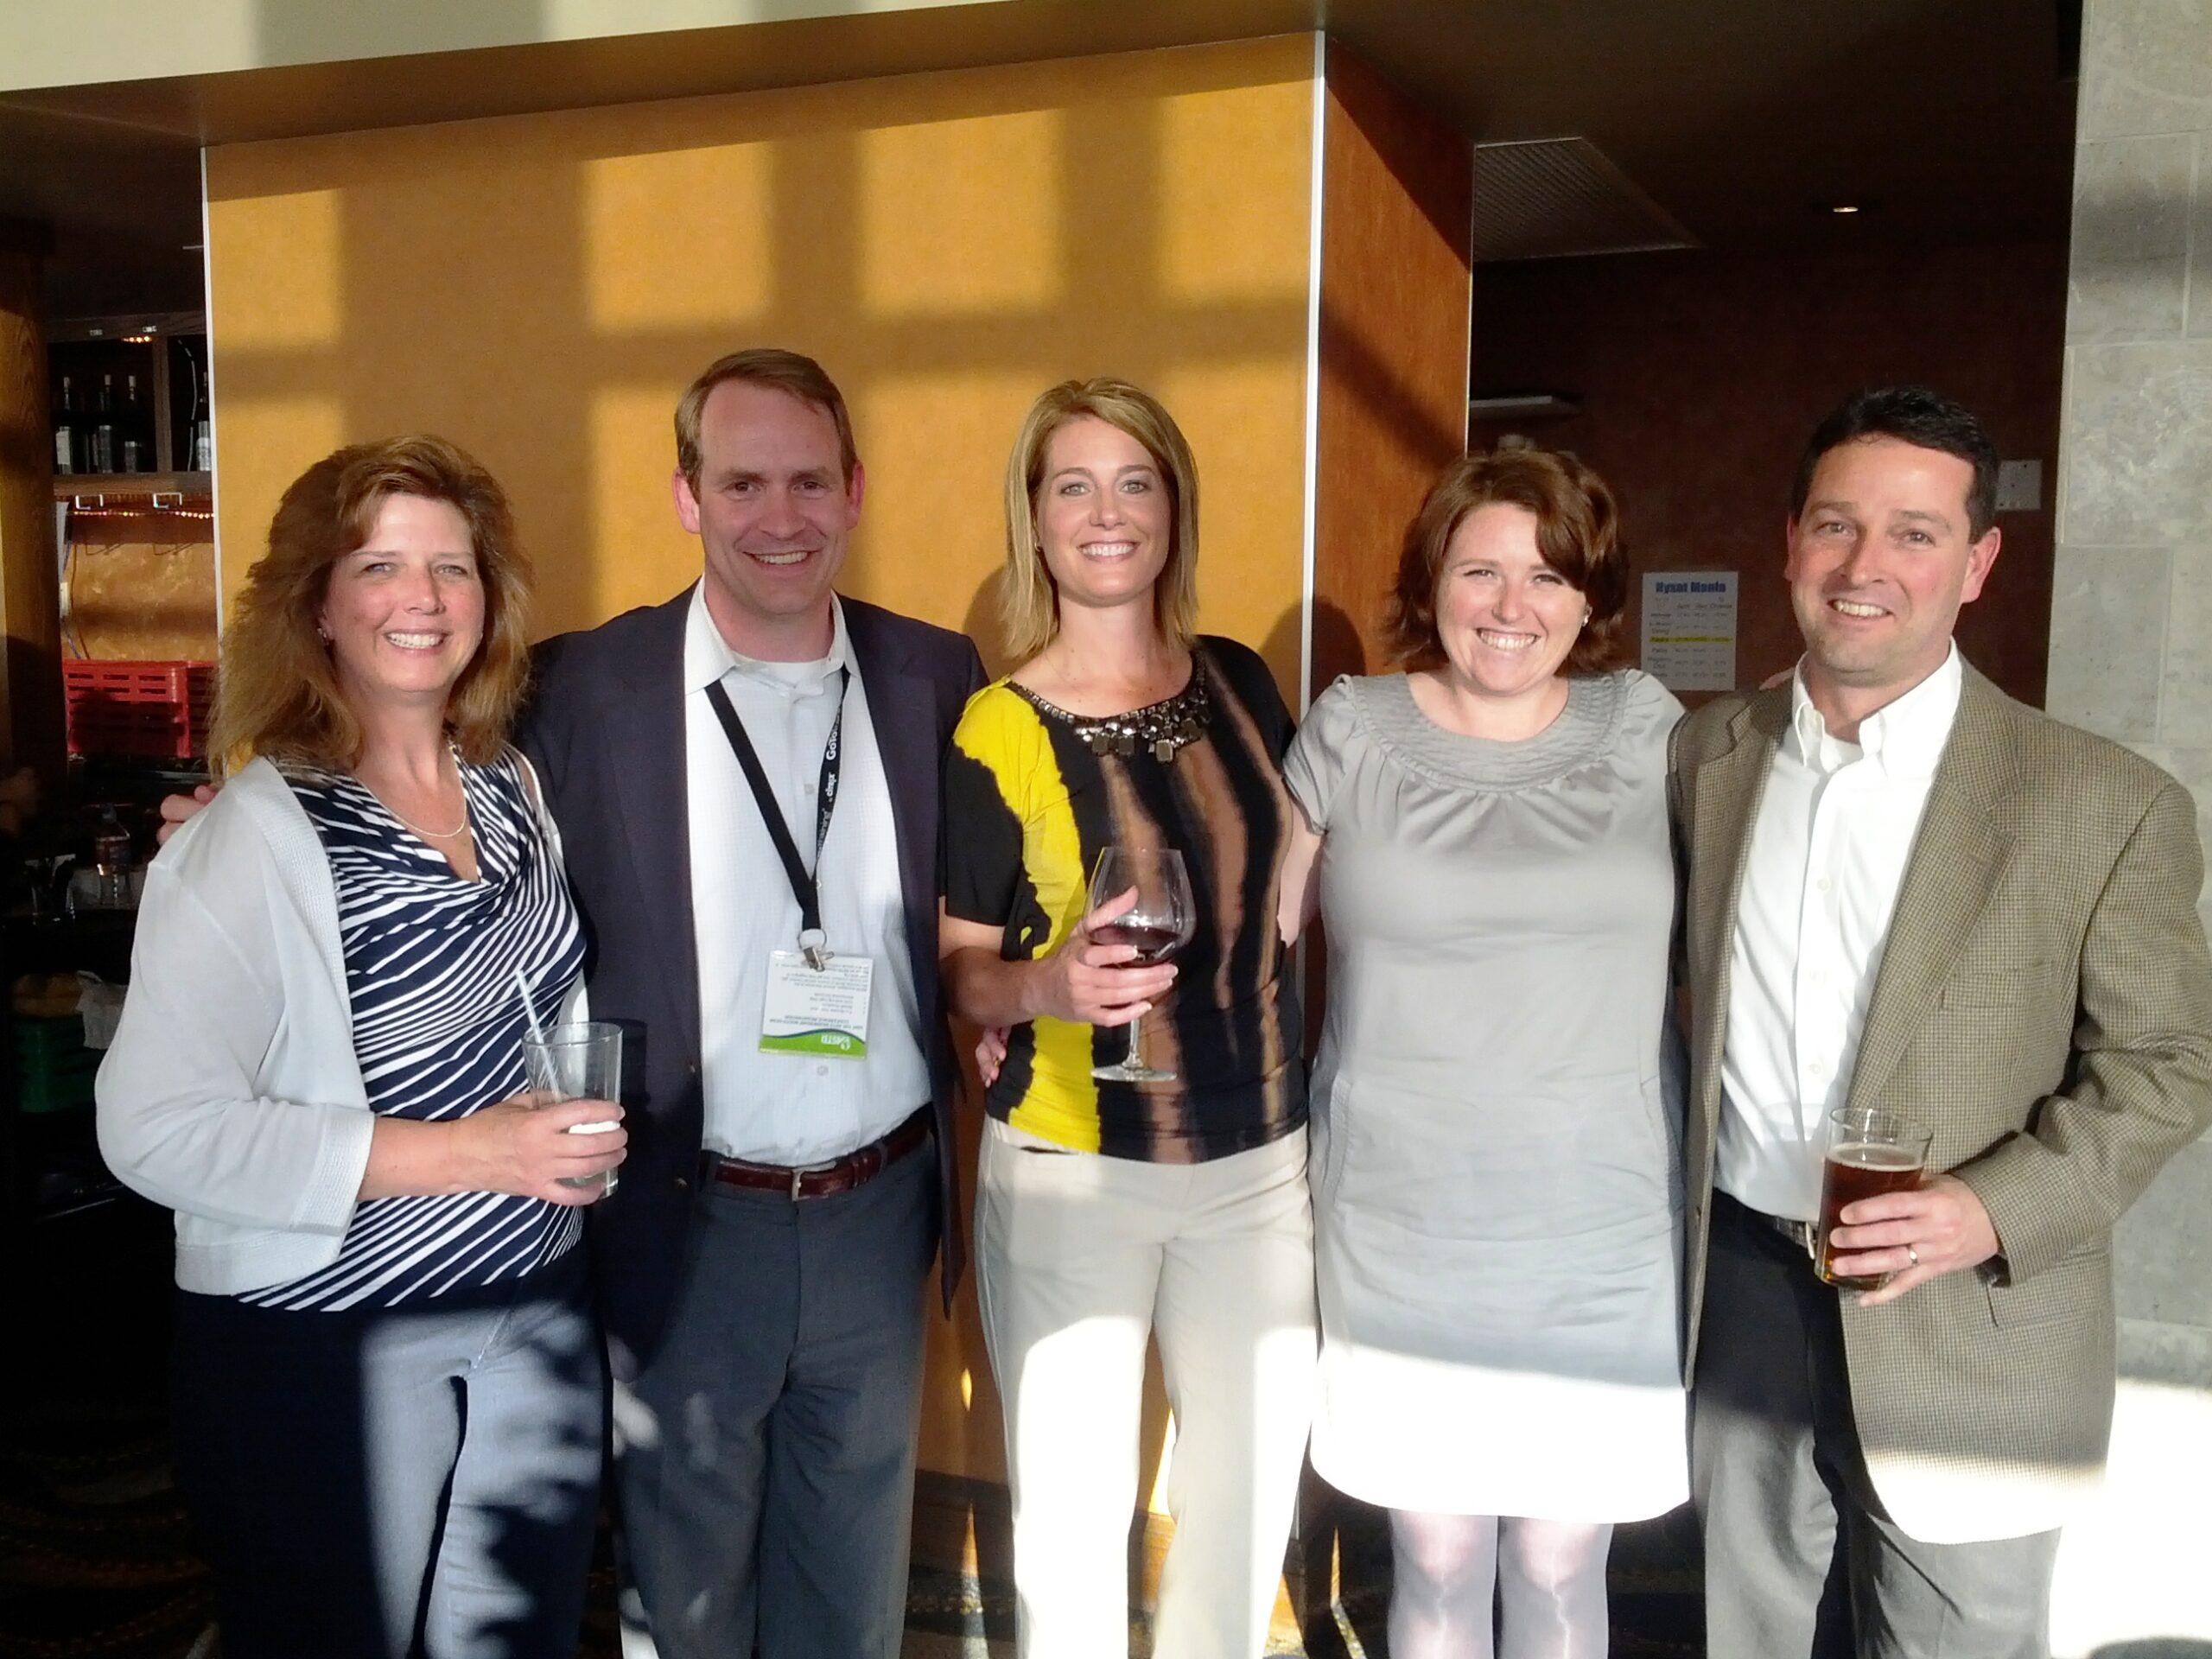 Group shot of Intrepid Learning team members